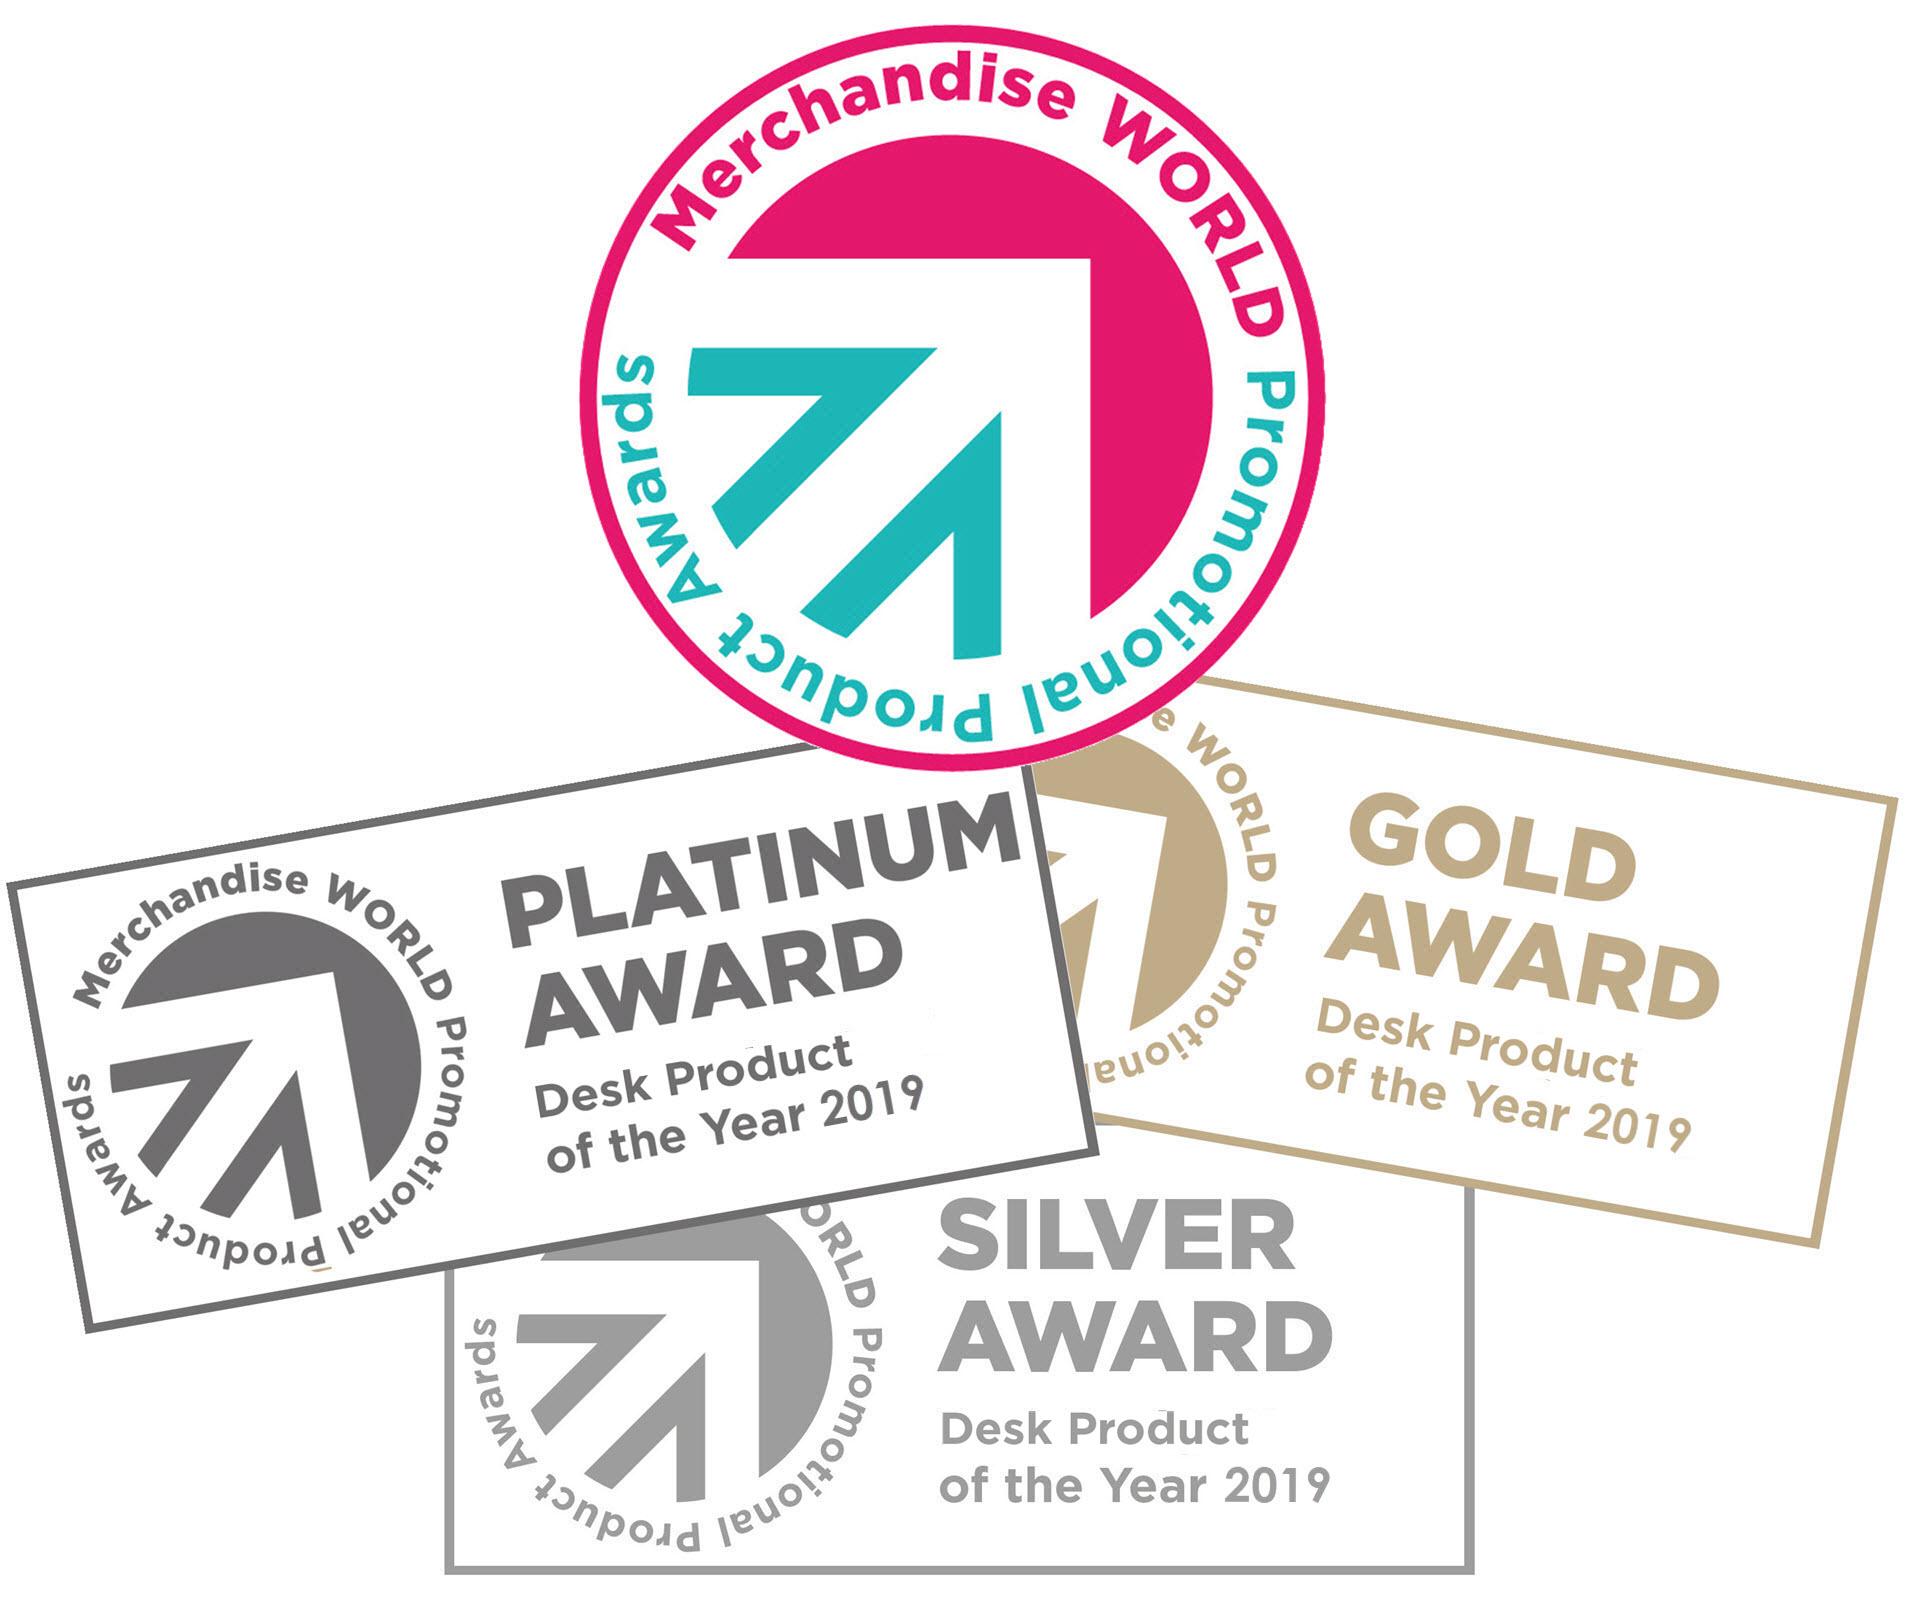 Merchandise World Product Awards Montage